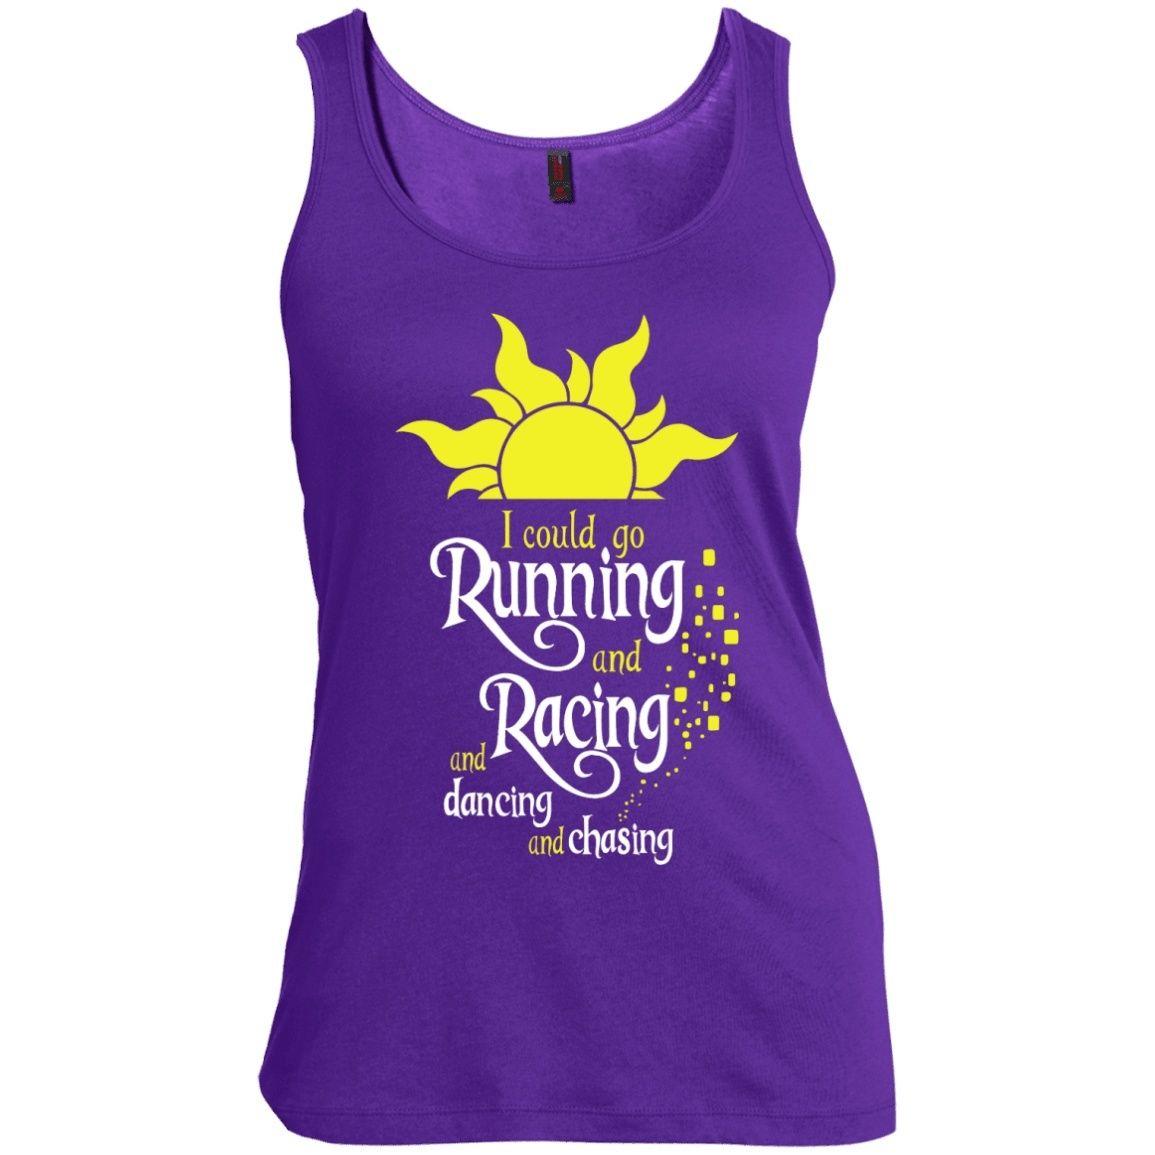 fee6acd6de I Could Go Running | Princess 1/2 Marathon | Run disney costumes ...